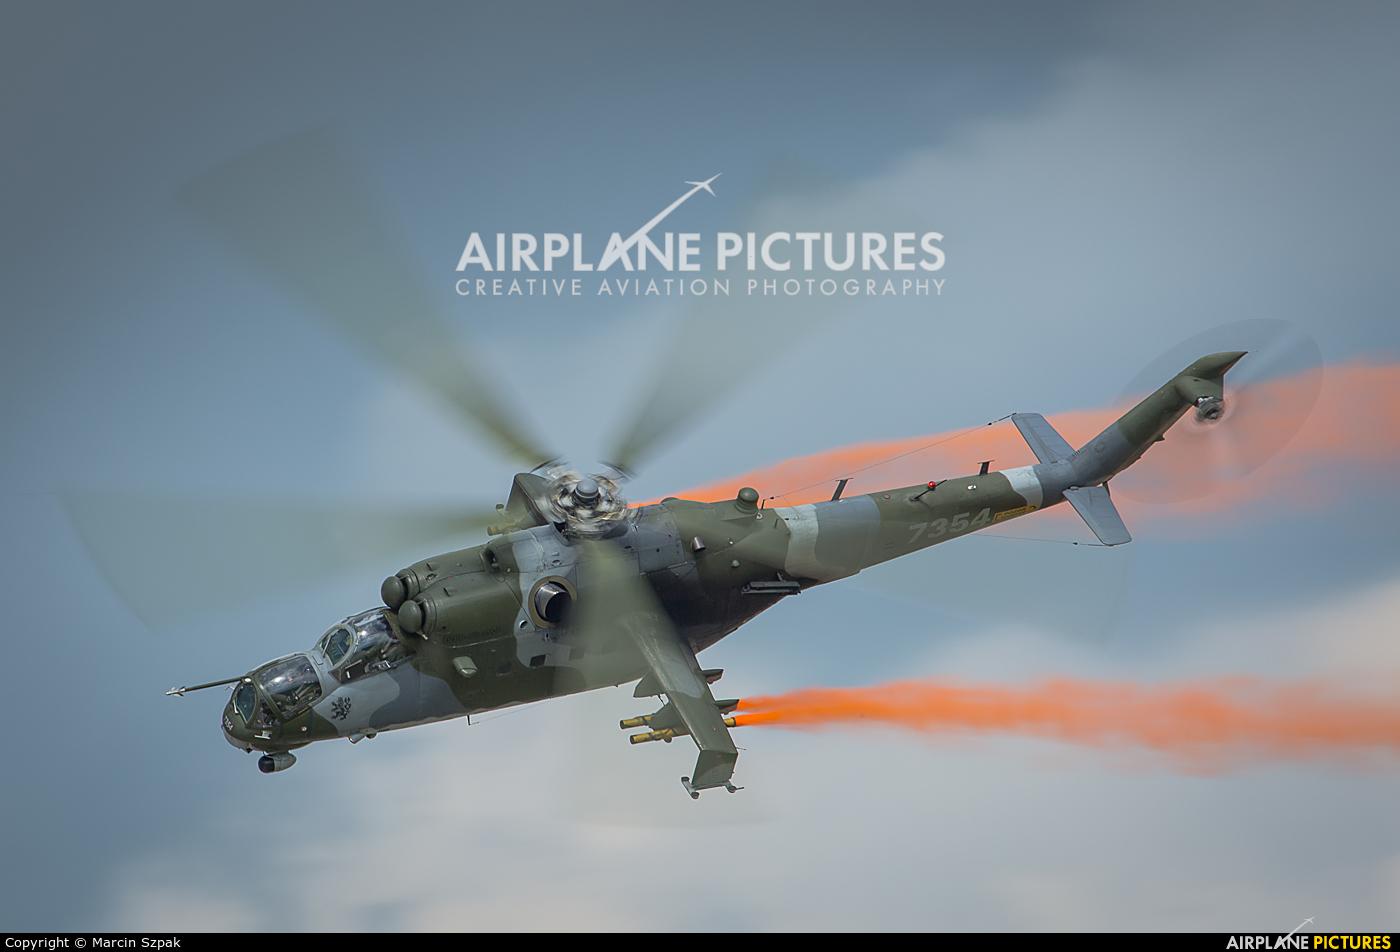 El juego de las imagenes-http://cdn.airplane-pictures.net/images/uploaded-images/2015/1/2/504872.jpg